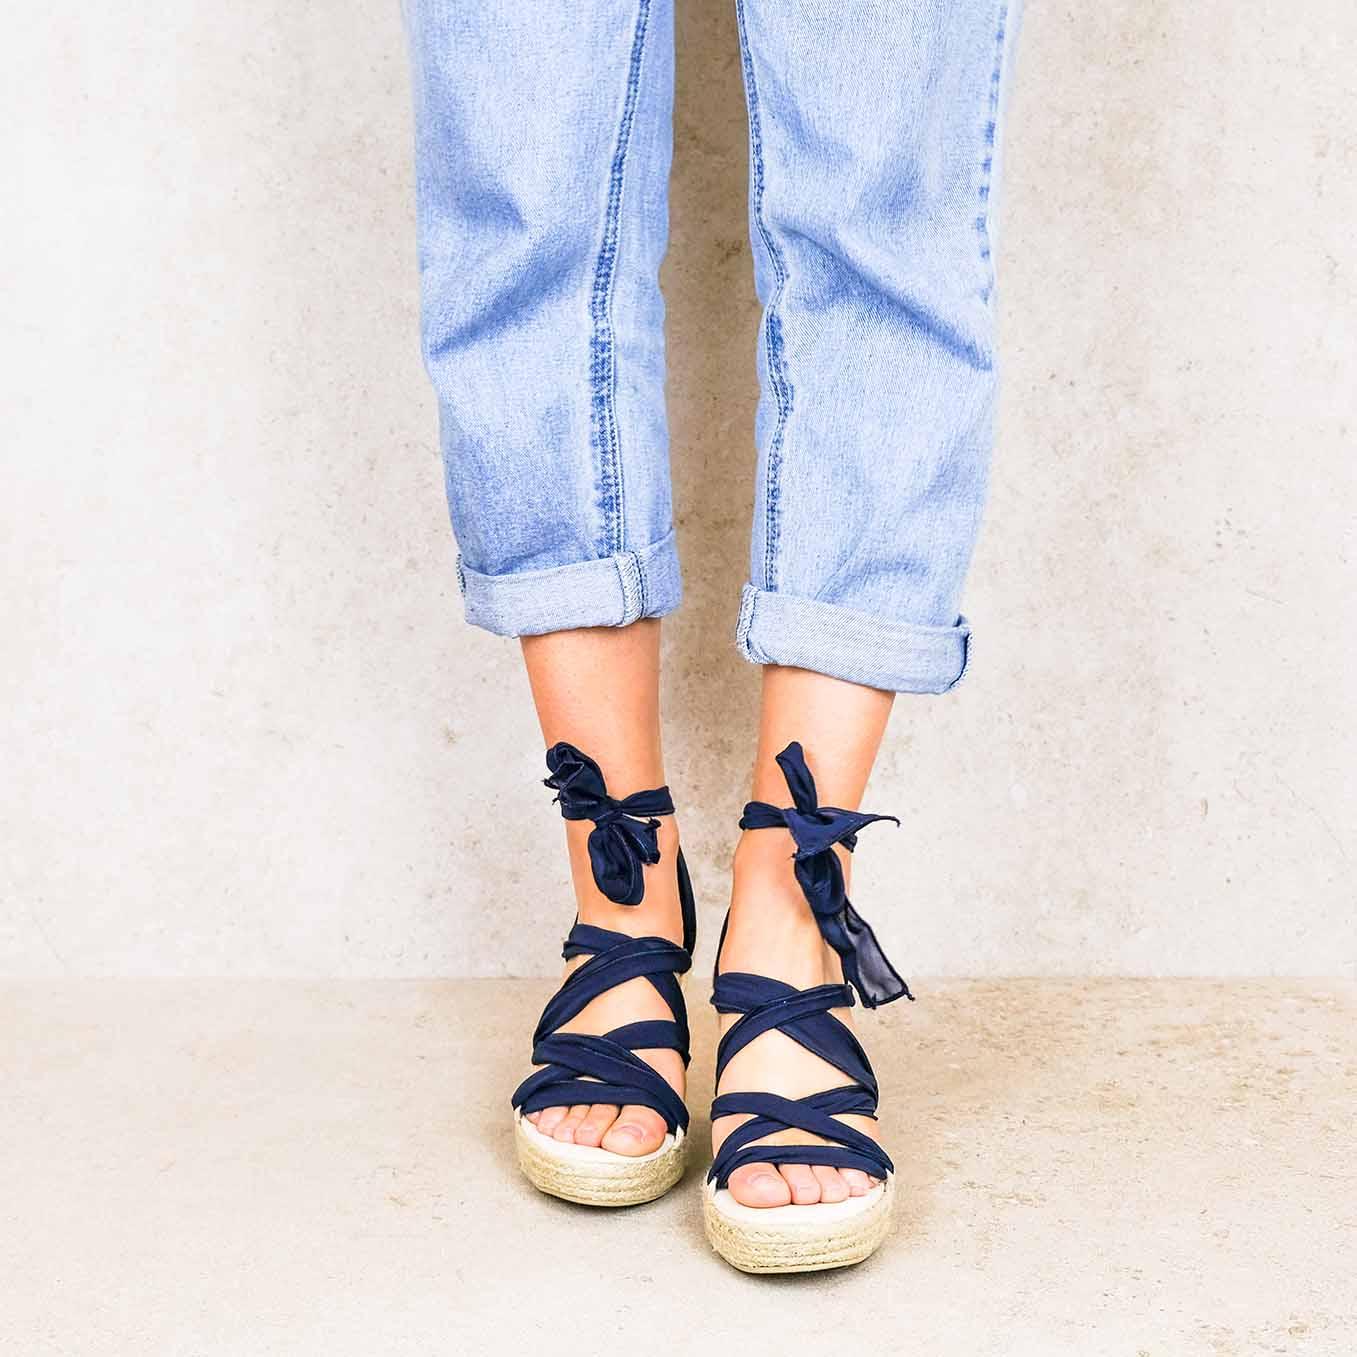 Oxford-blue_elegance ribbons linten lintsandalen sandals travelsandals vegan sustainable sandals wikkelsandalen